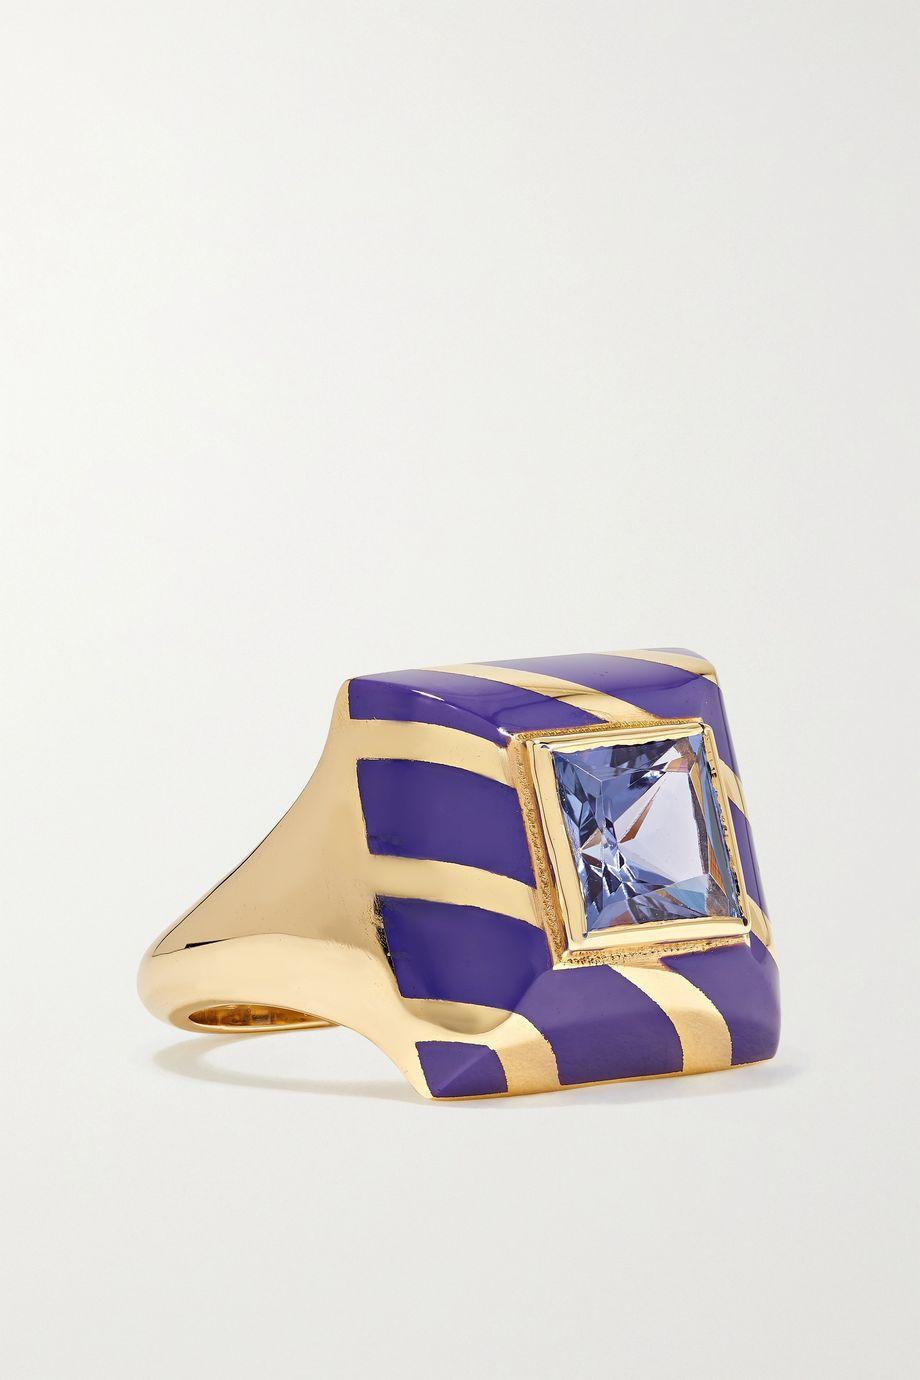 Alice Cicolini Candy Lacquer 14-karat gold, tanzanite and enamel ring